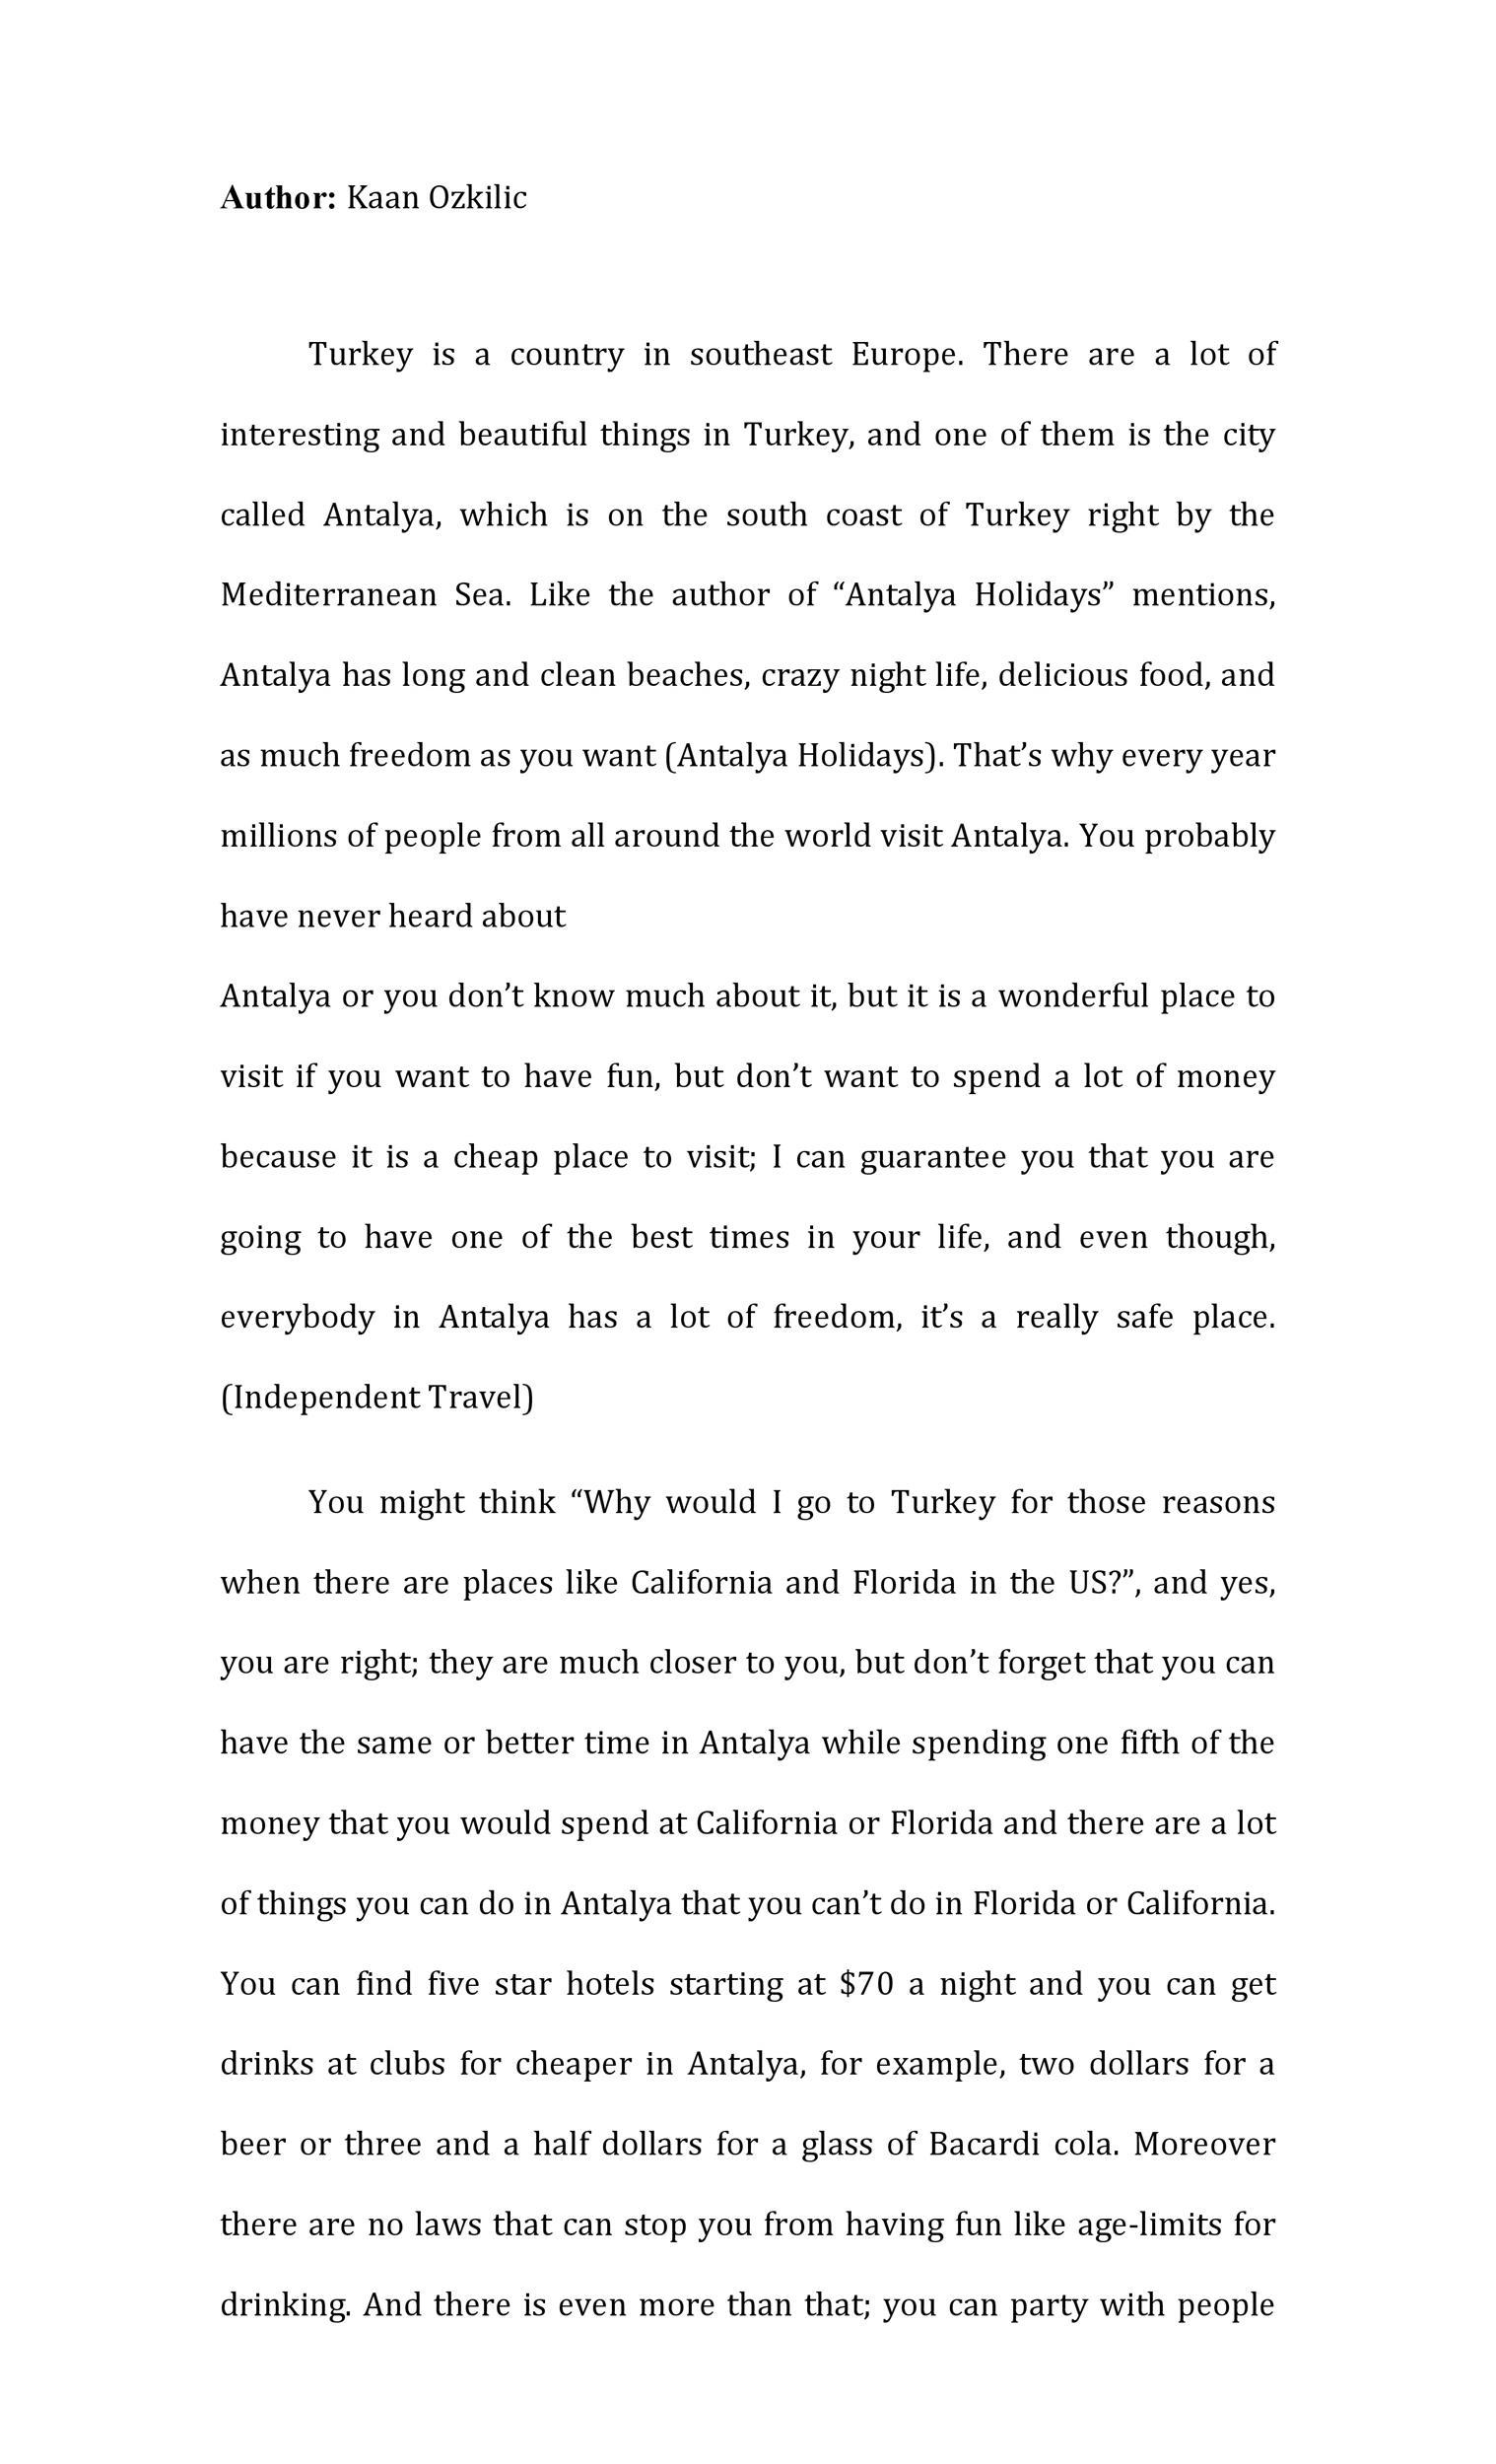 Free persuasive essay example 04